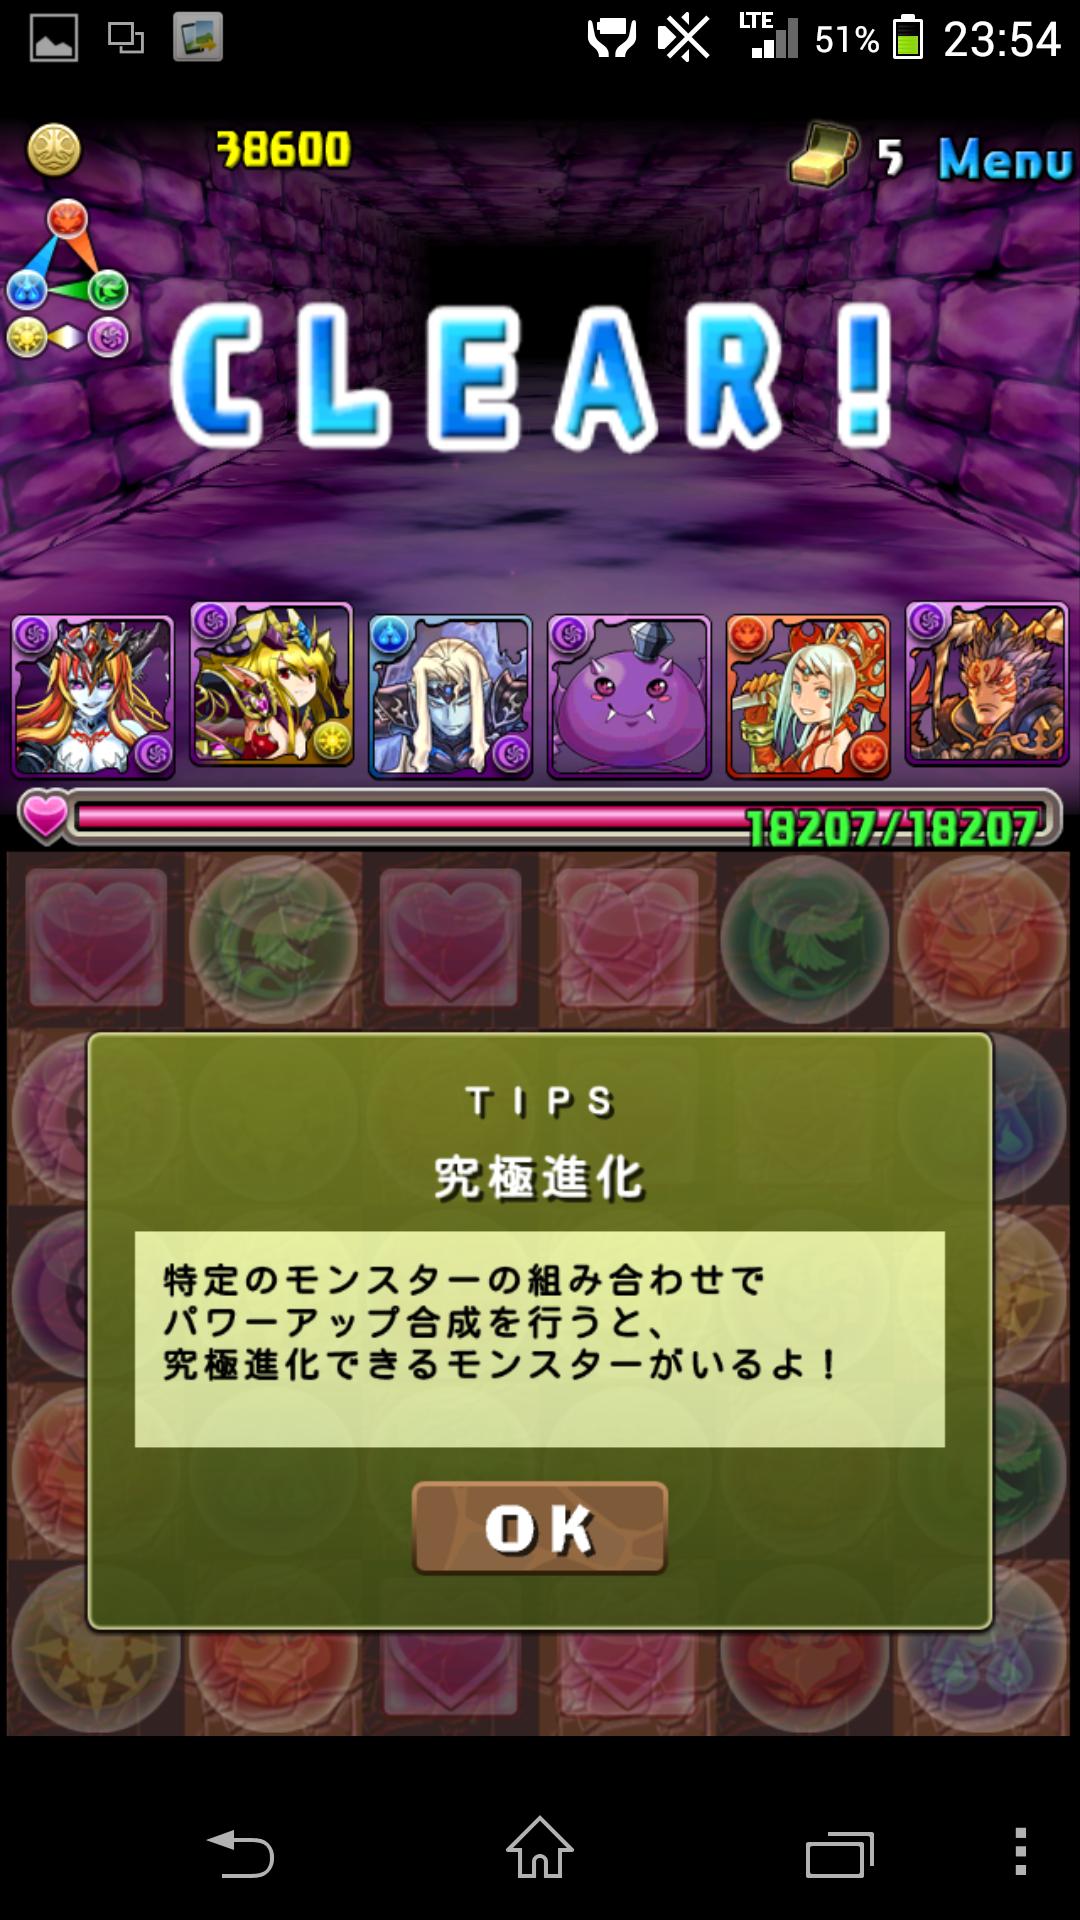 Screenshot_2014-04-17-23-54-33.png